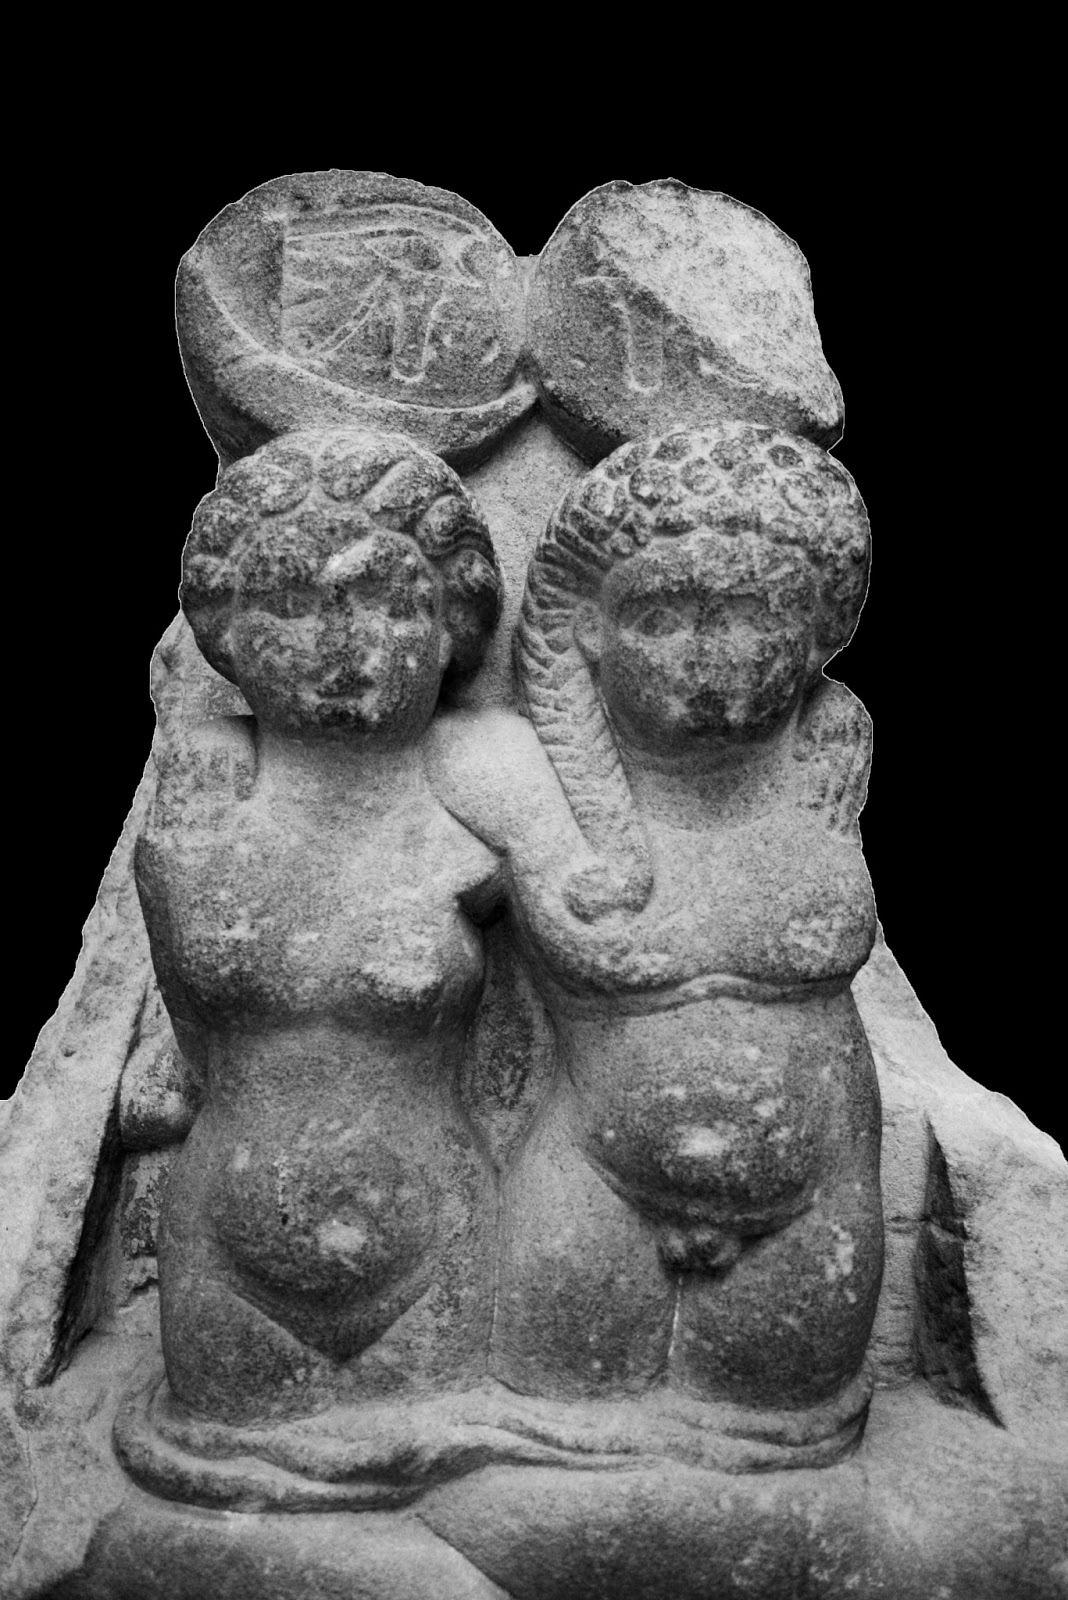 cleopatraselenealexanderhelios twins born to antony and